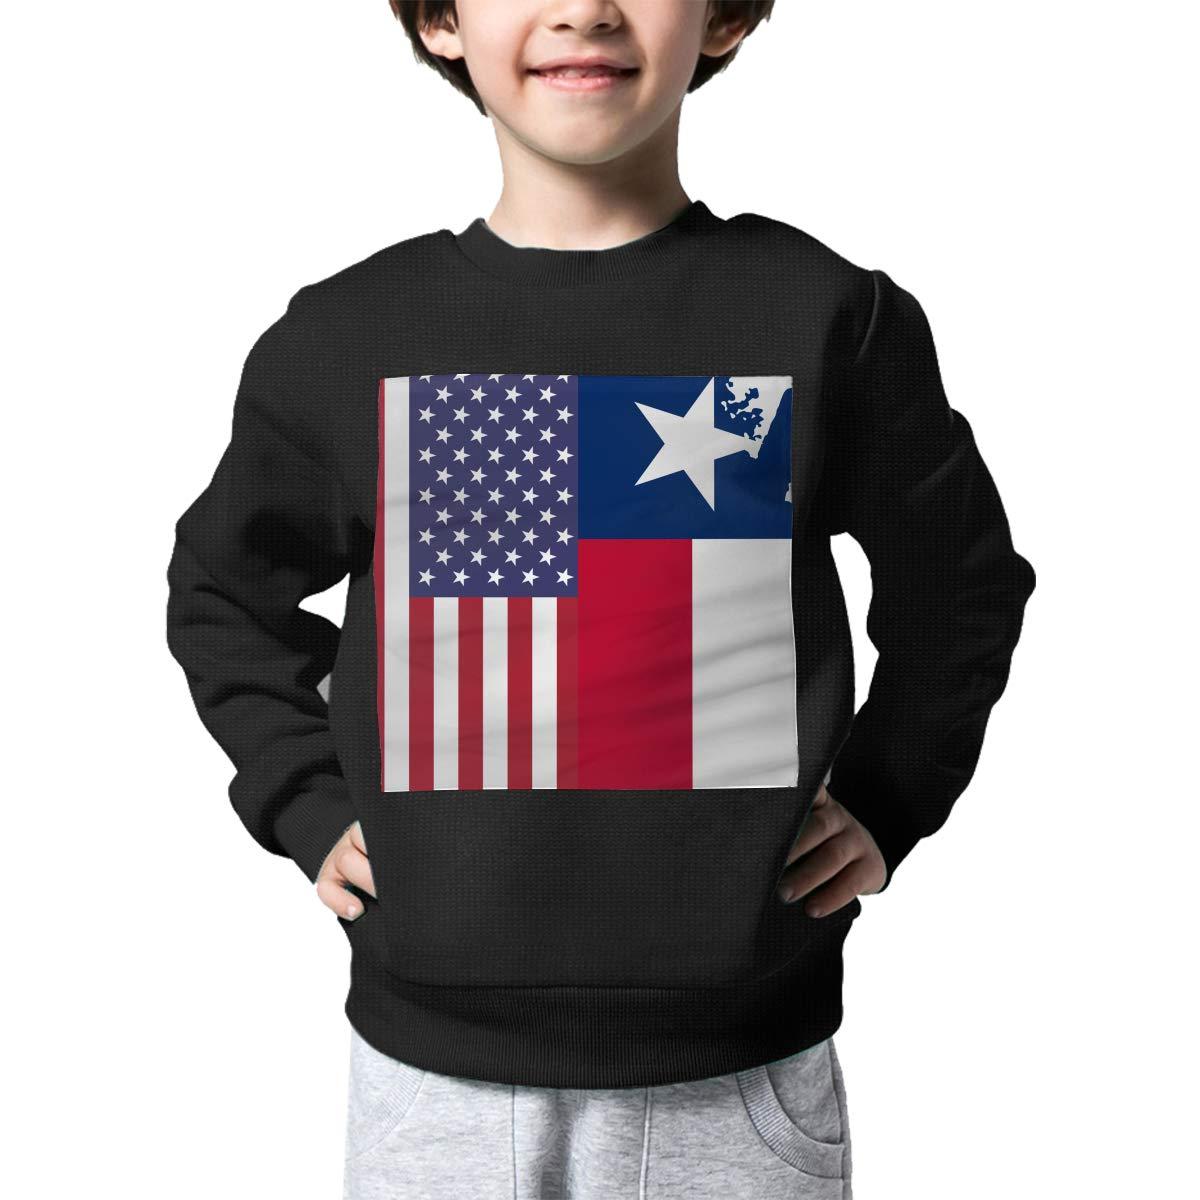 NJKM5MJ Boys Girls American Texas Flag Lovely Sweaters Soft Warm Childrens Sweater